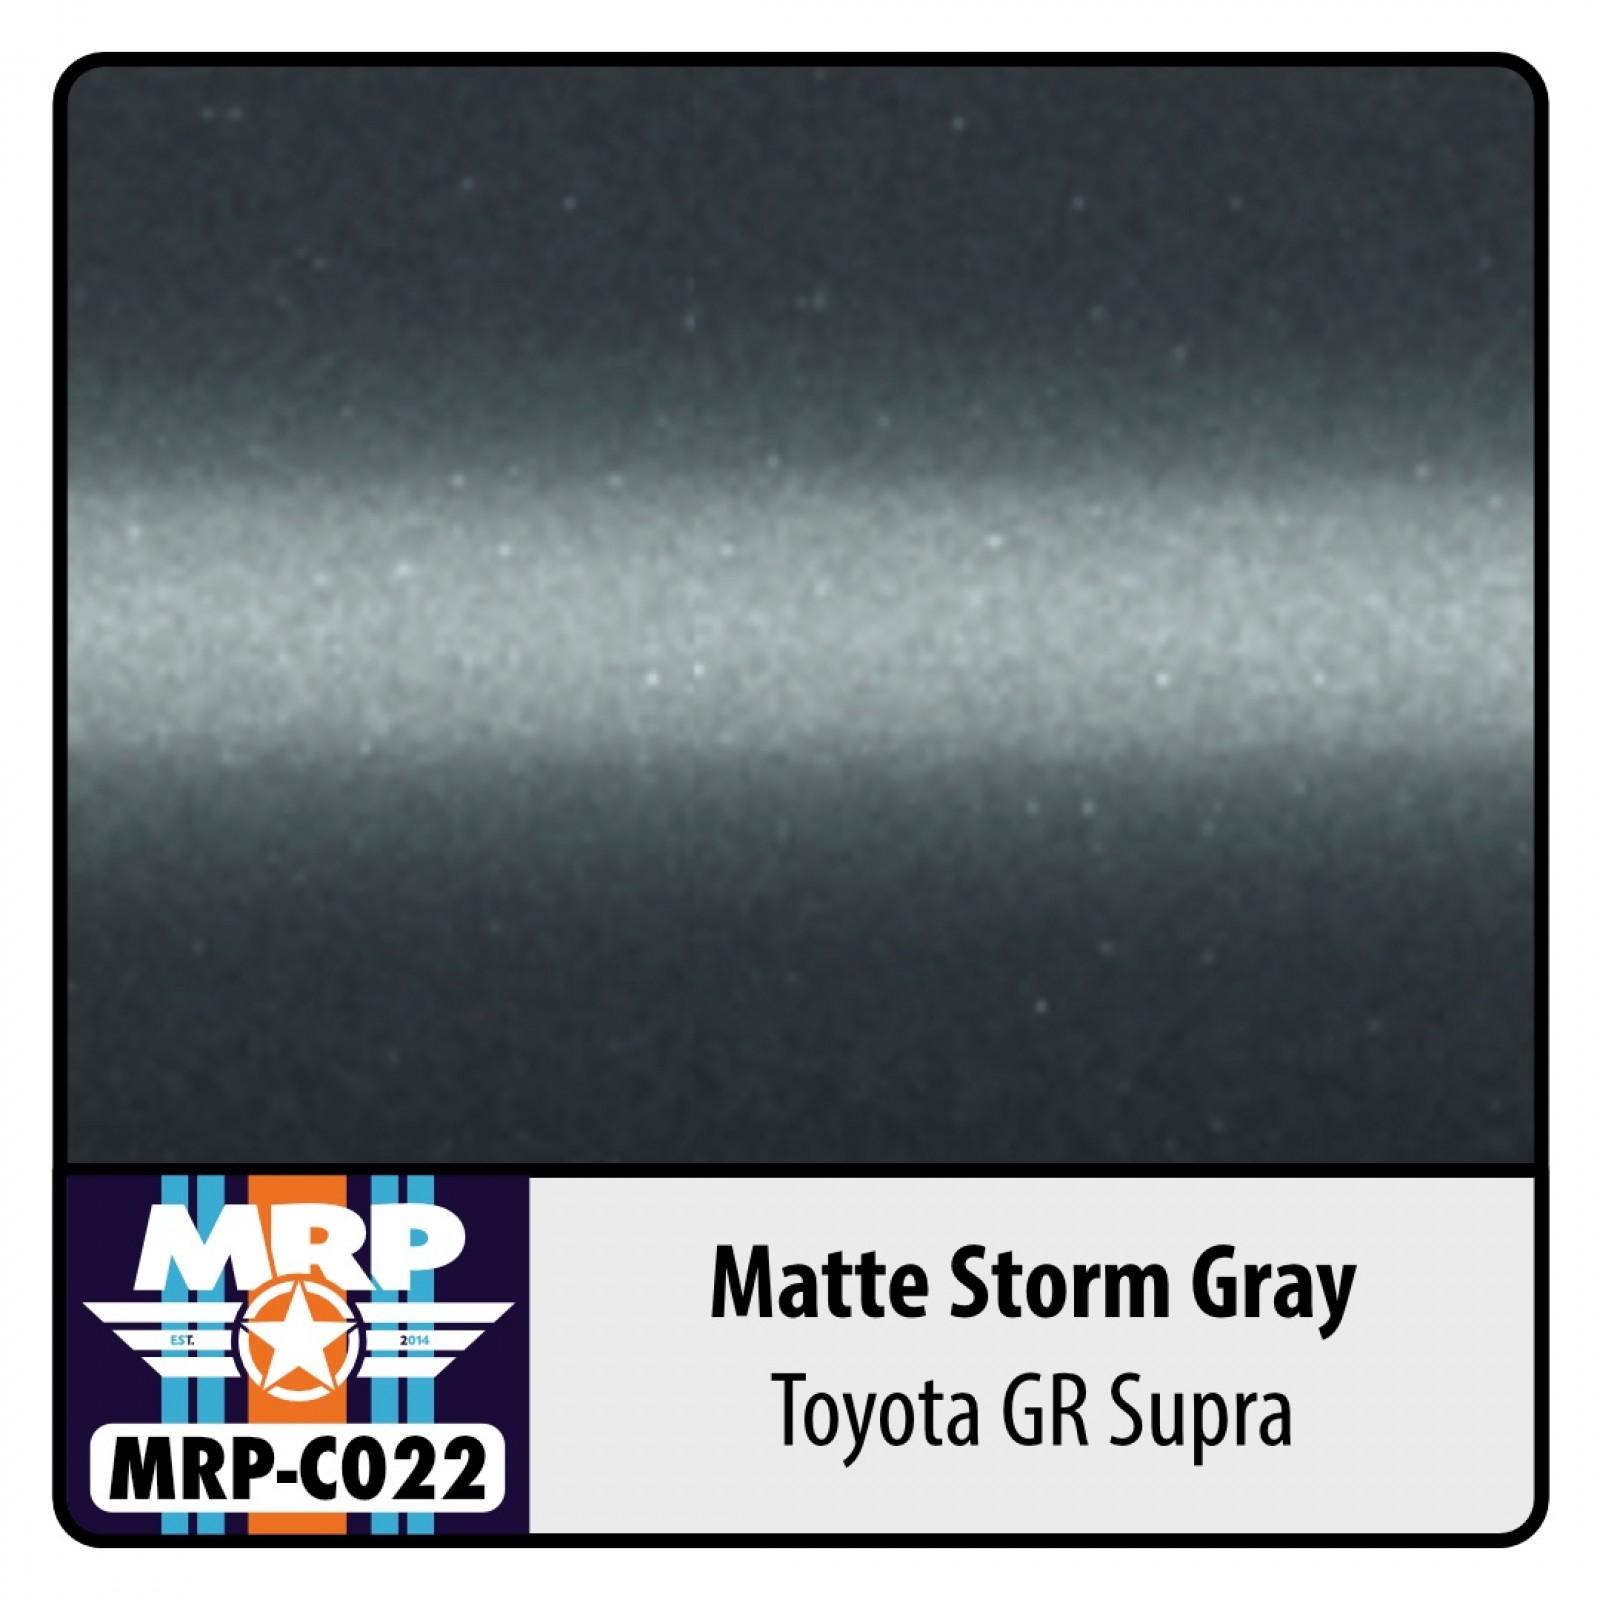 MRP-C022  Toyota GR Supra Matte  Storm Gray